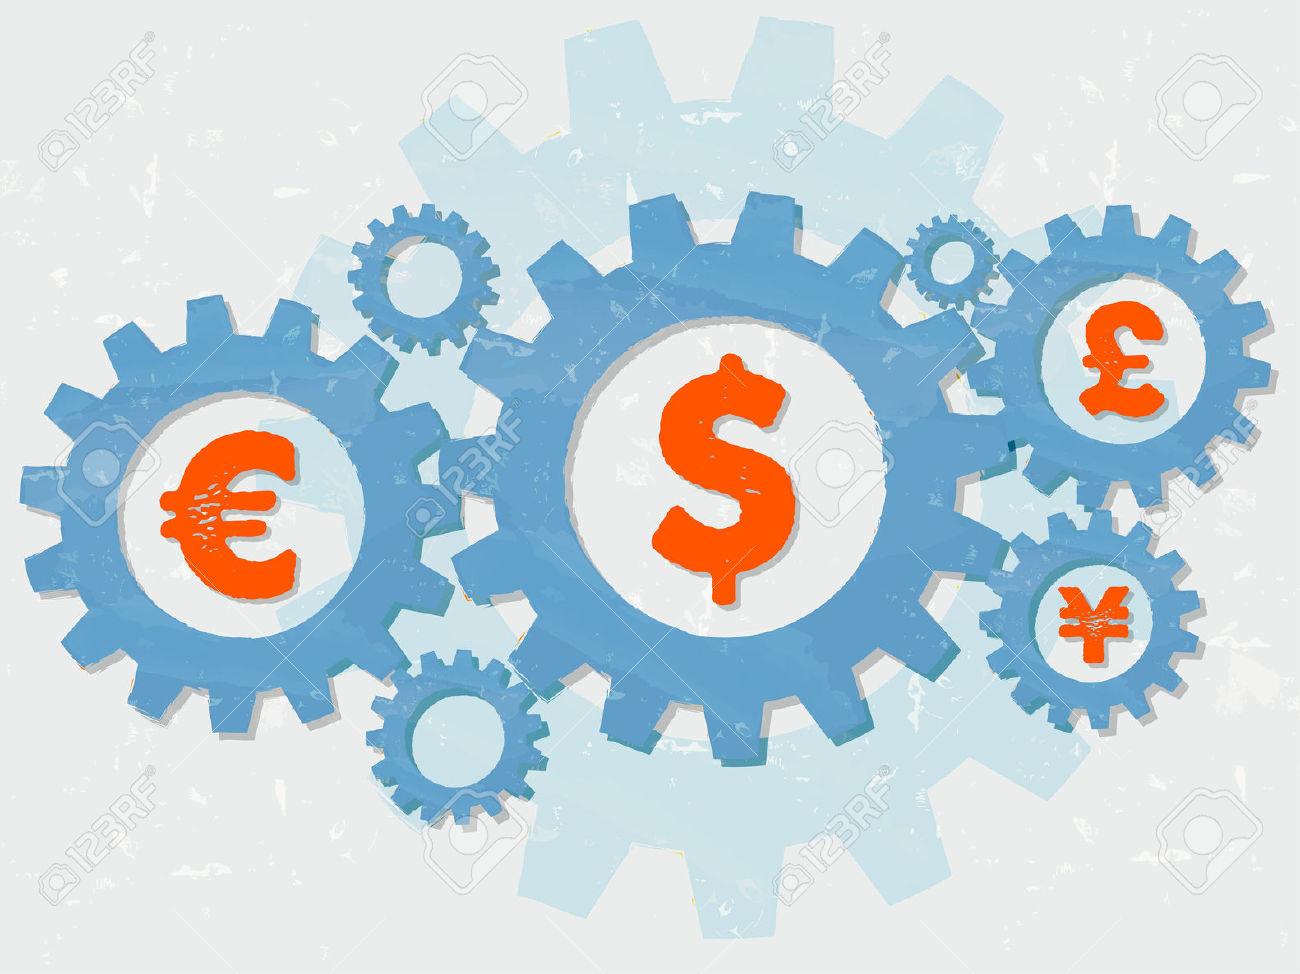 Euro, Dollar, Pound And Yen Signs.